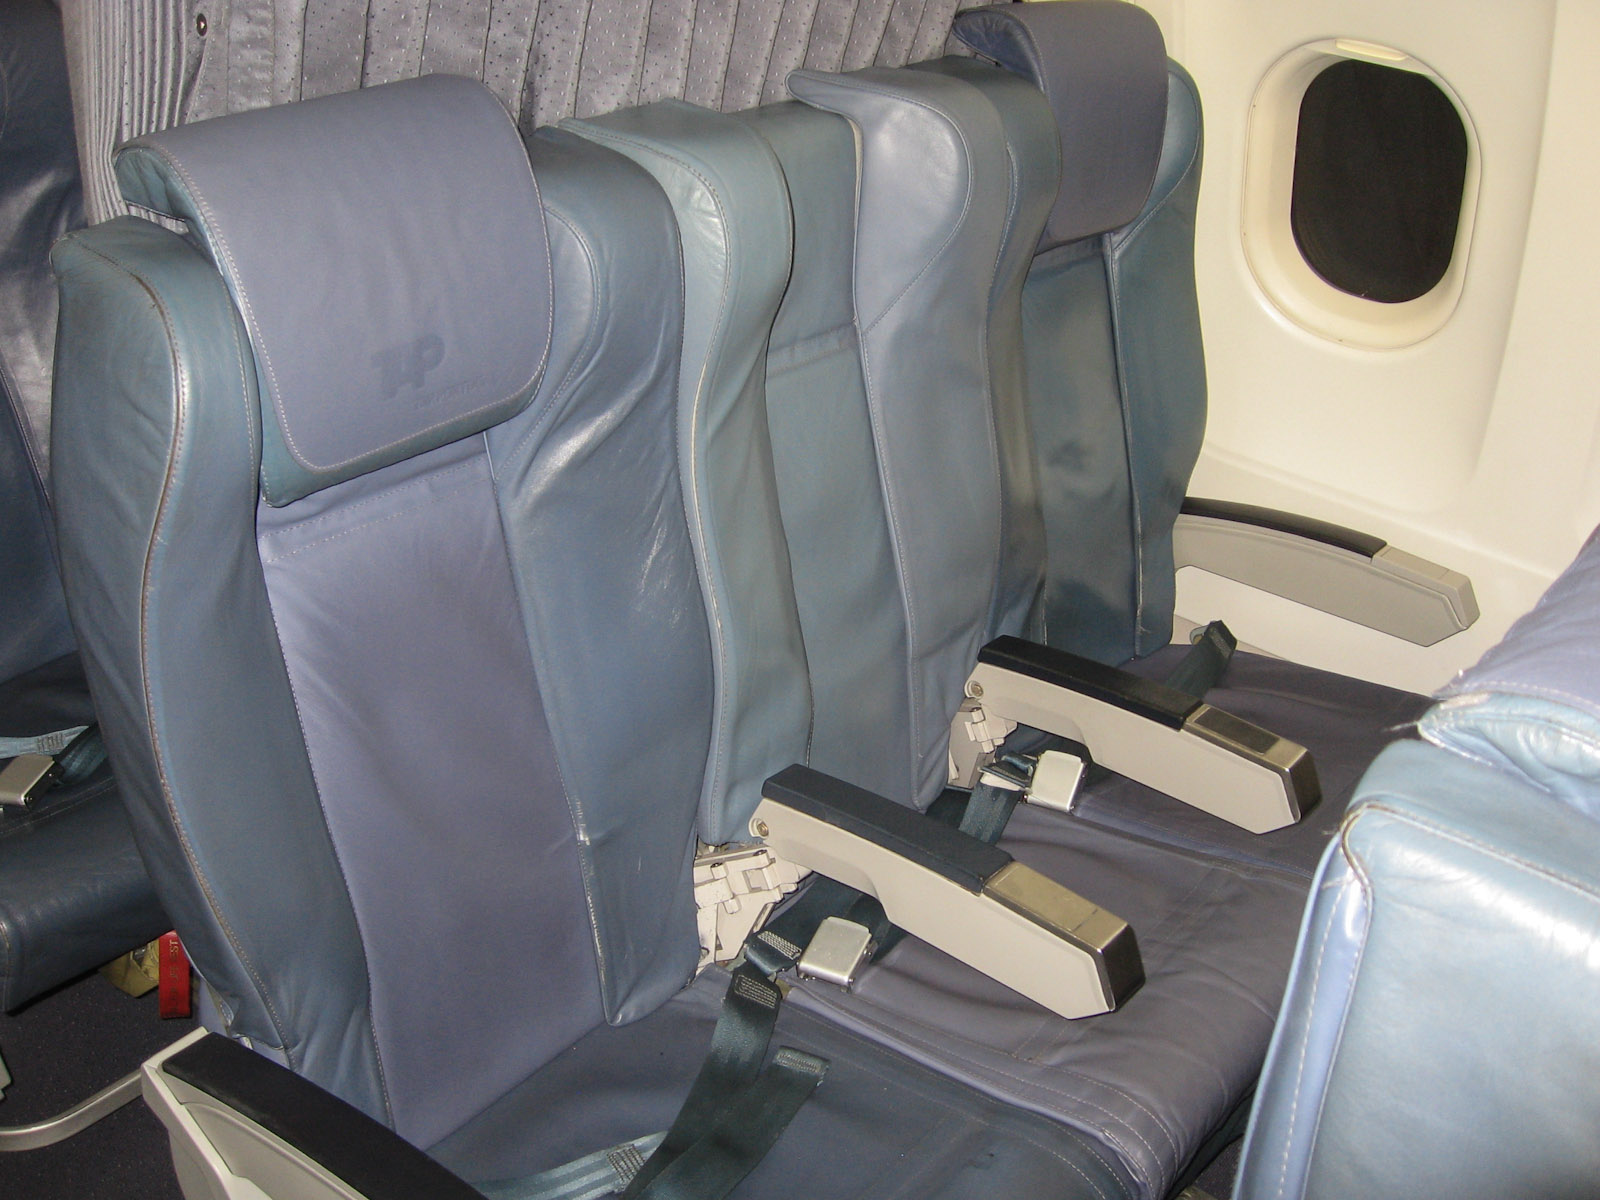 Кресла бизнес-класса в самолете Airbus A319 авиакомпании TAP Portugal